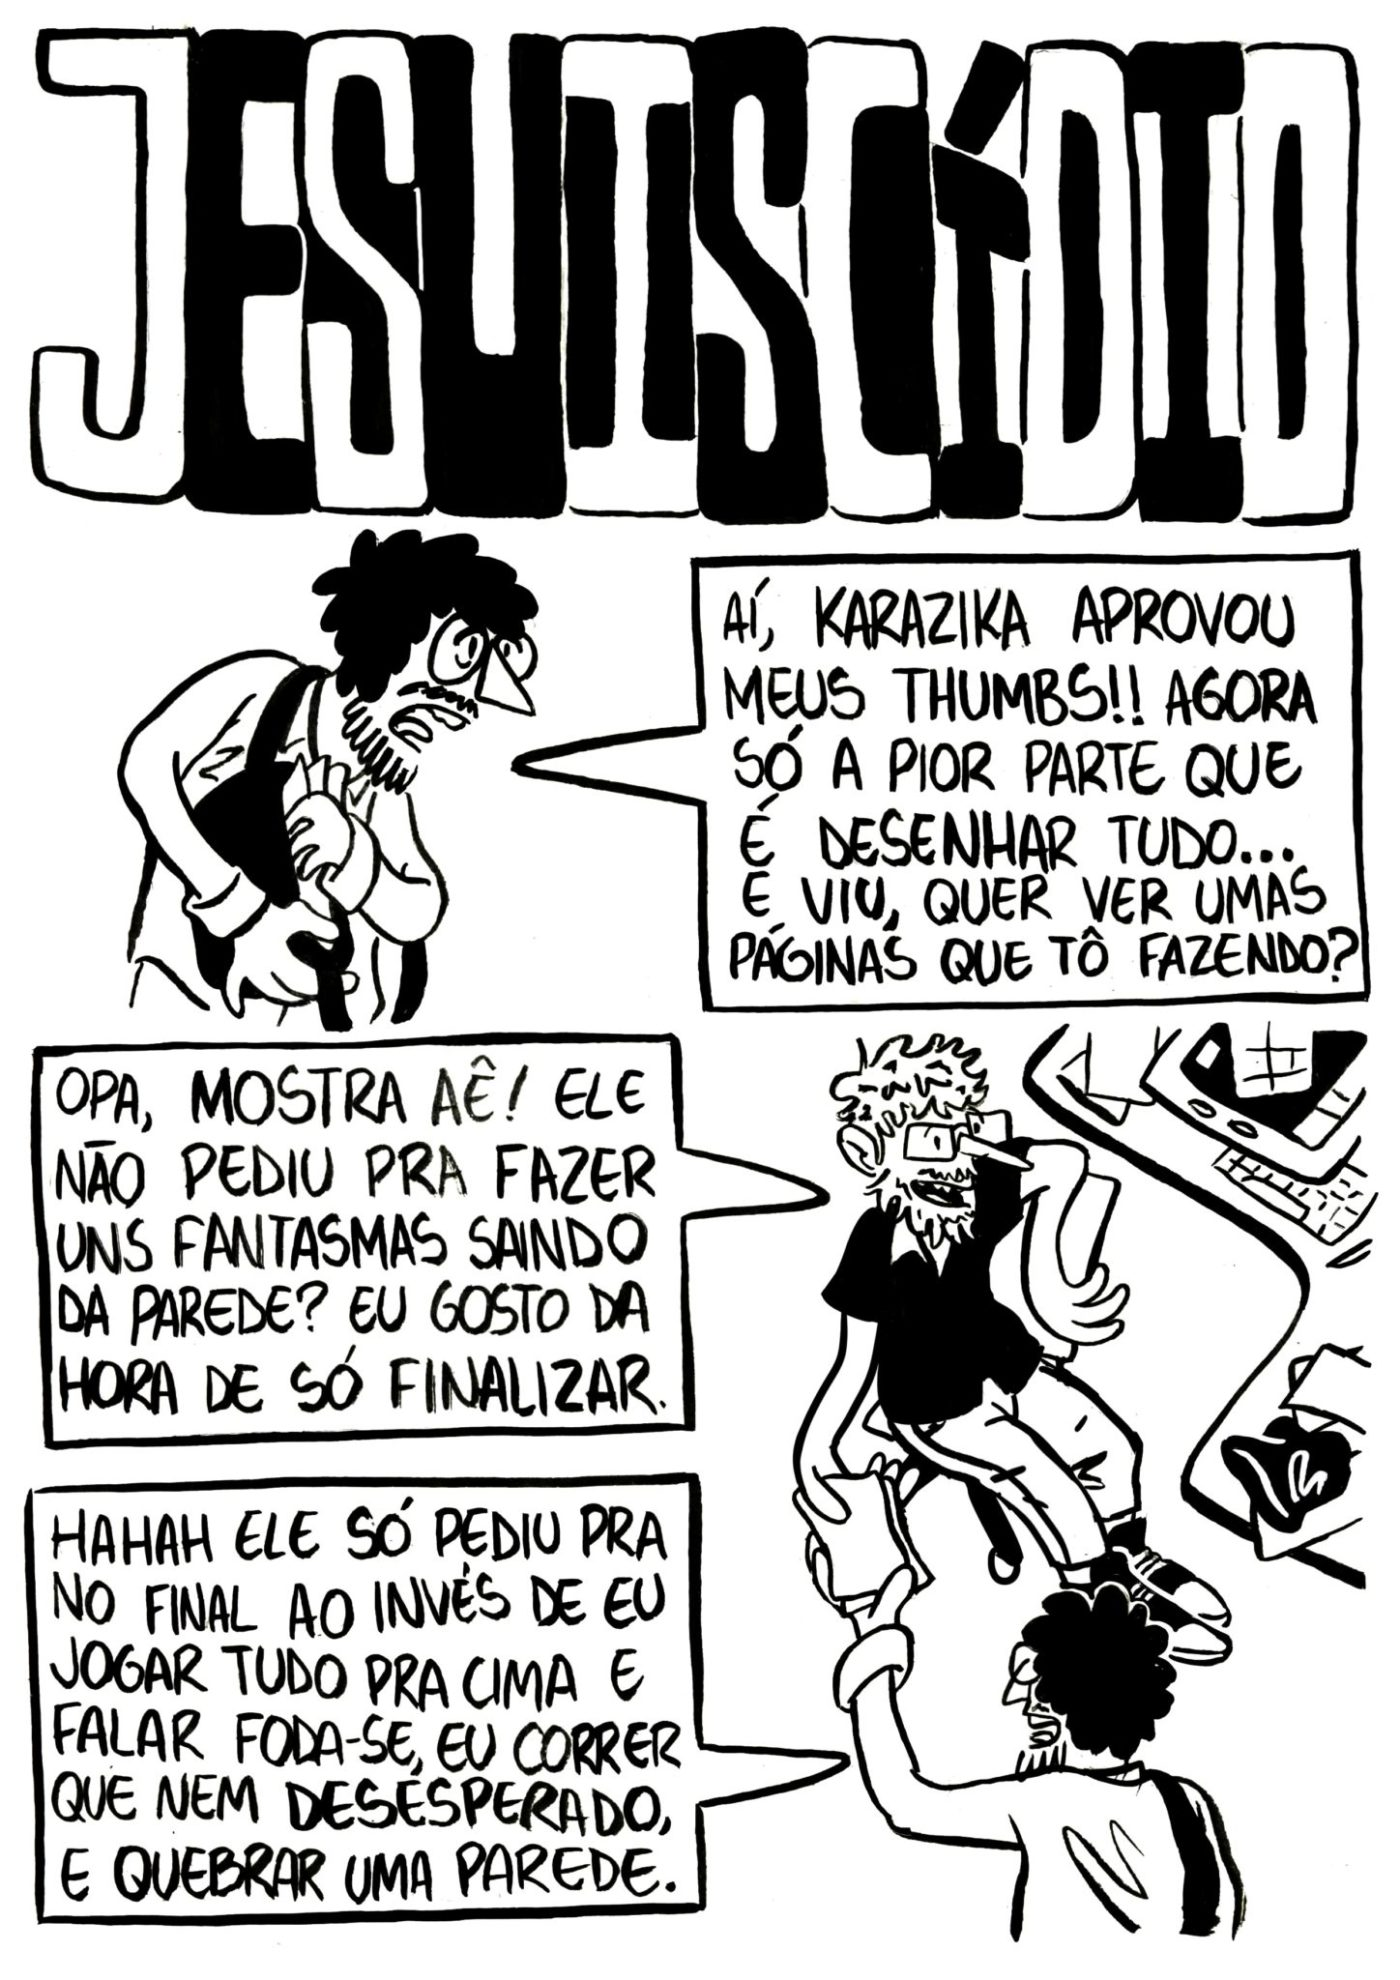 Je Suis Cídio #2, por João B. Godoi